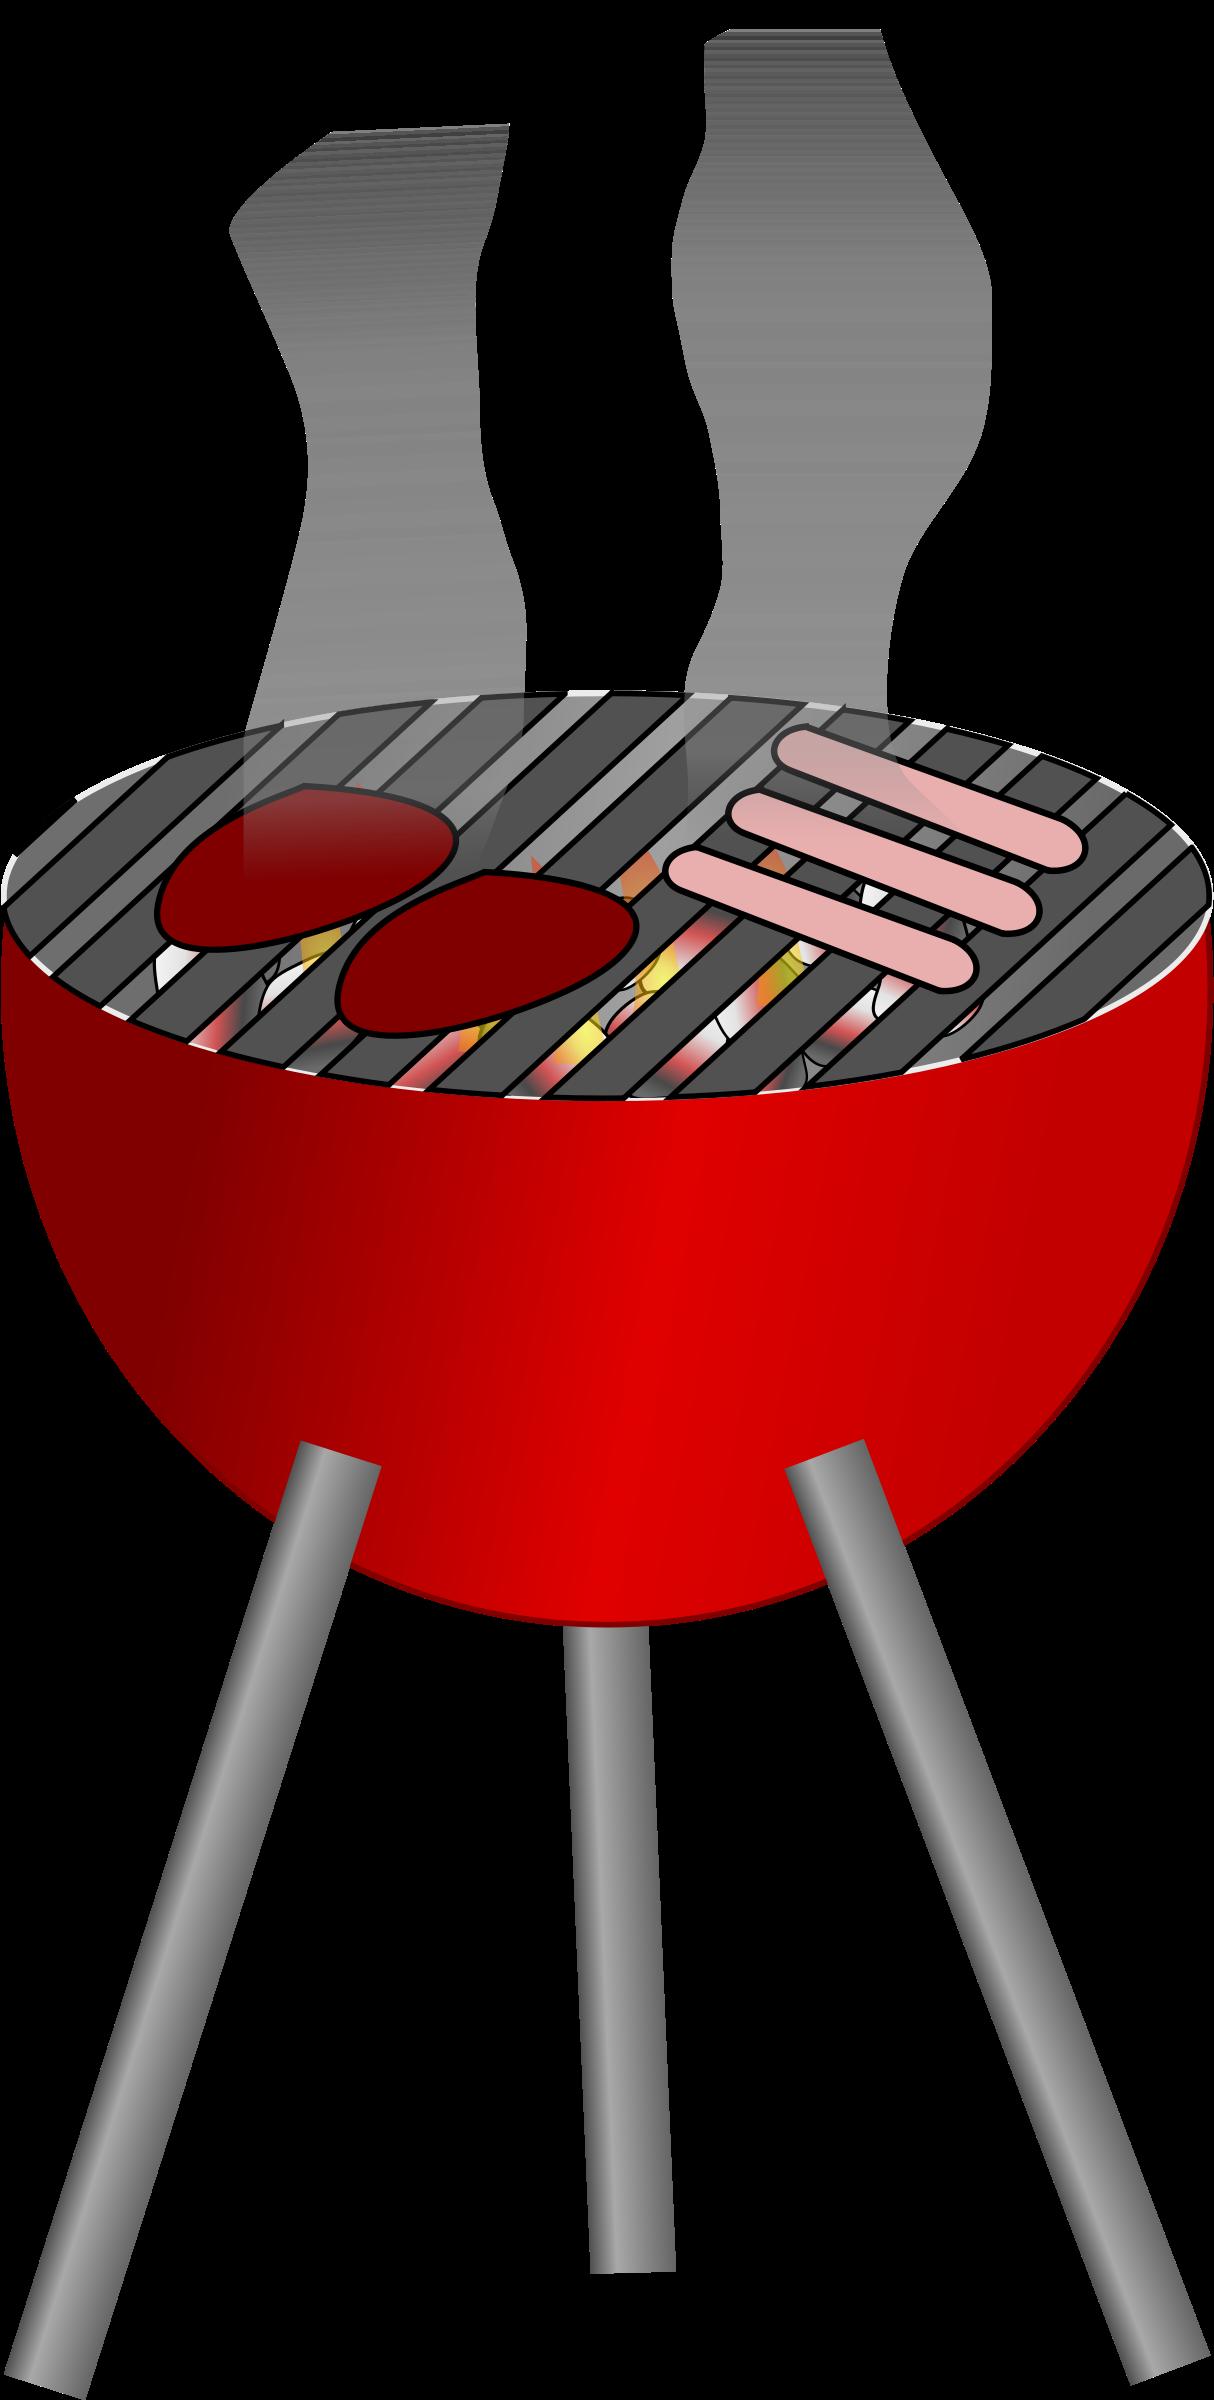 Grill Clip Art - ClipArt Best